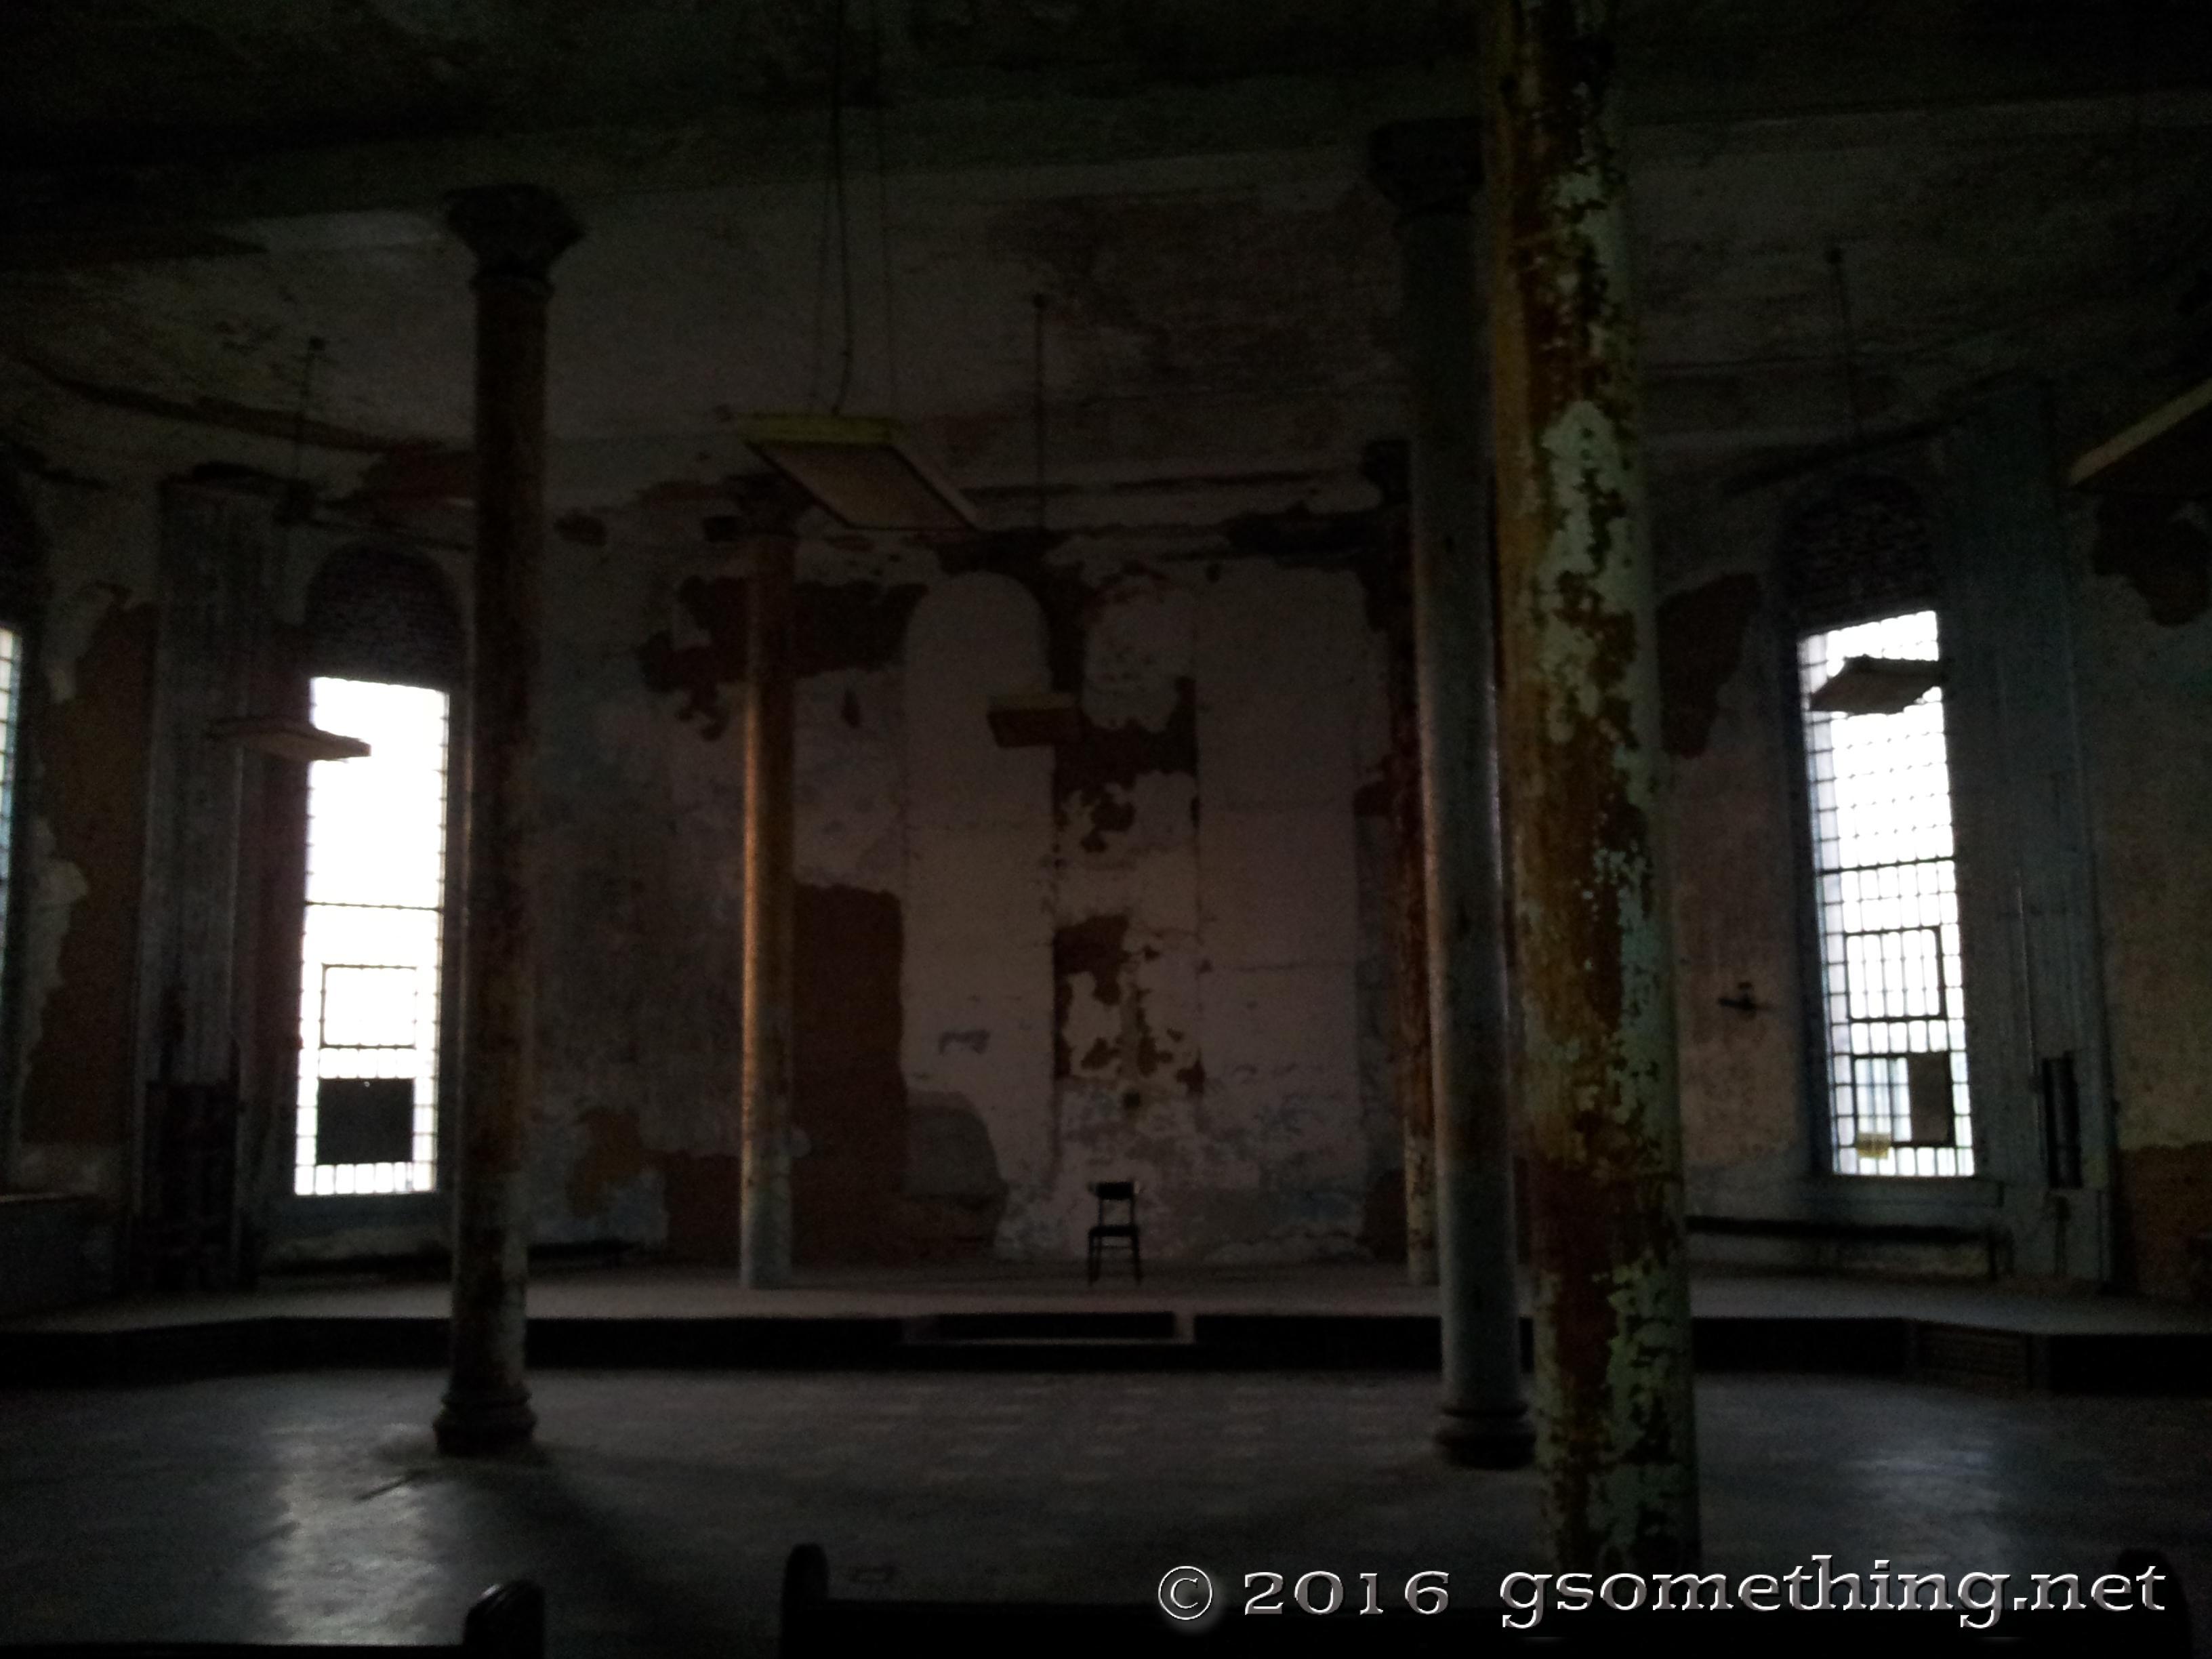 mansfield_reformatory_1st_trip_12.jpg